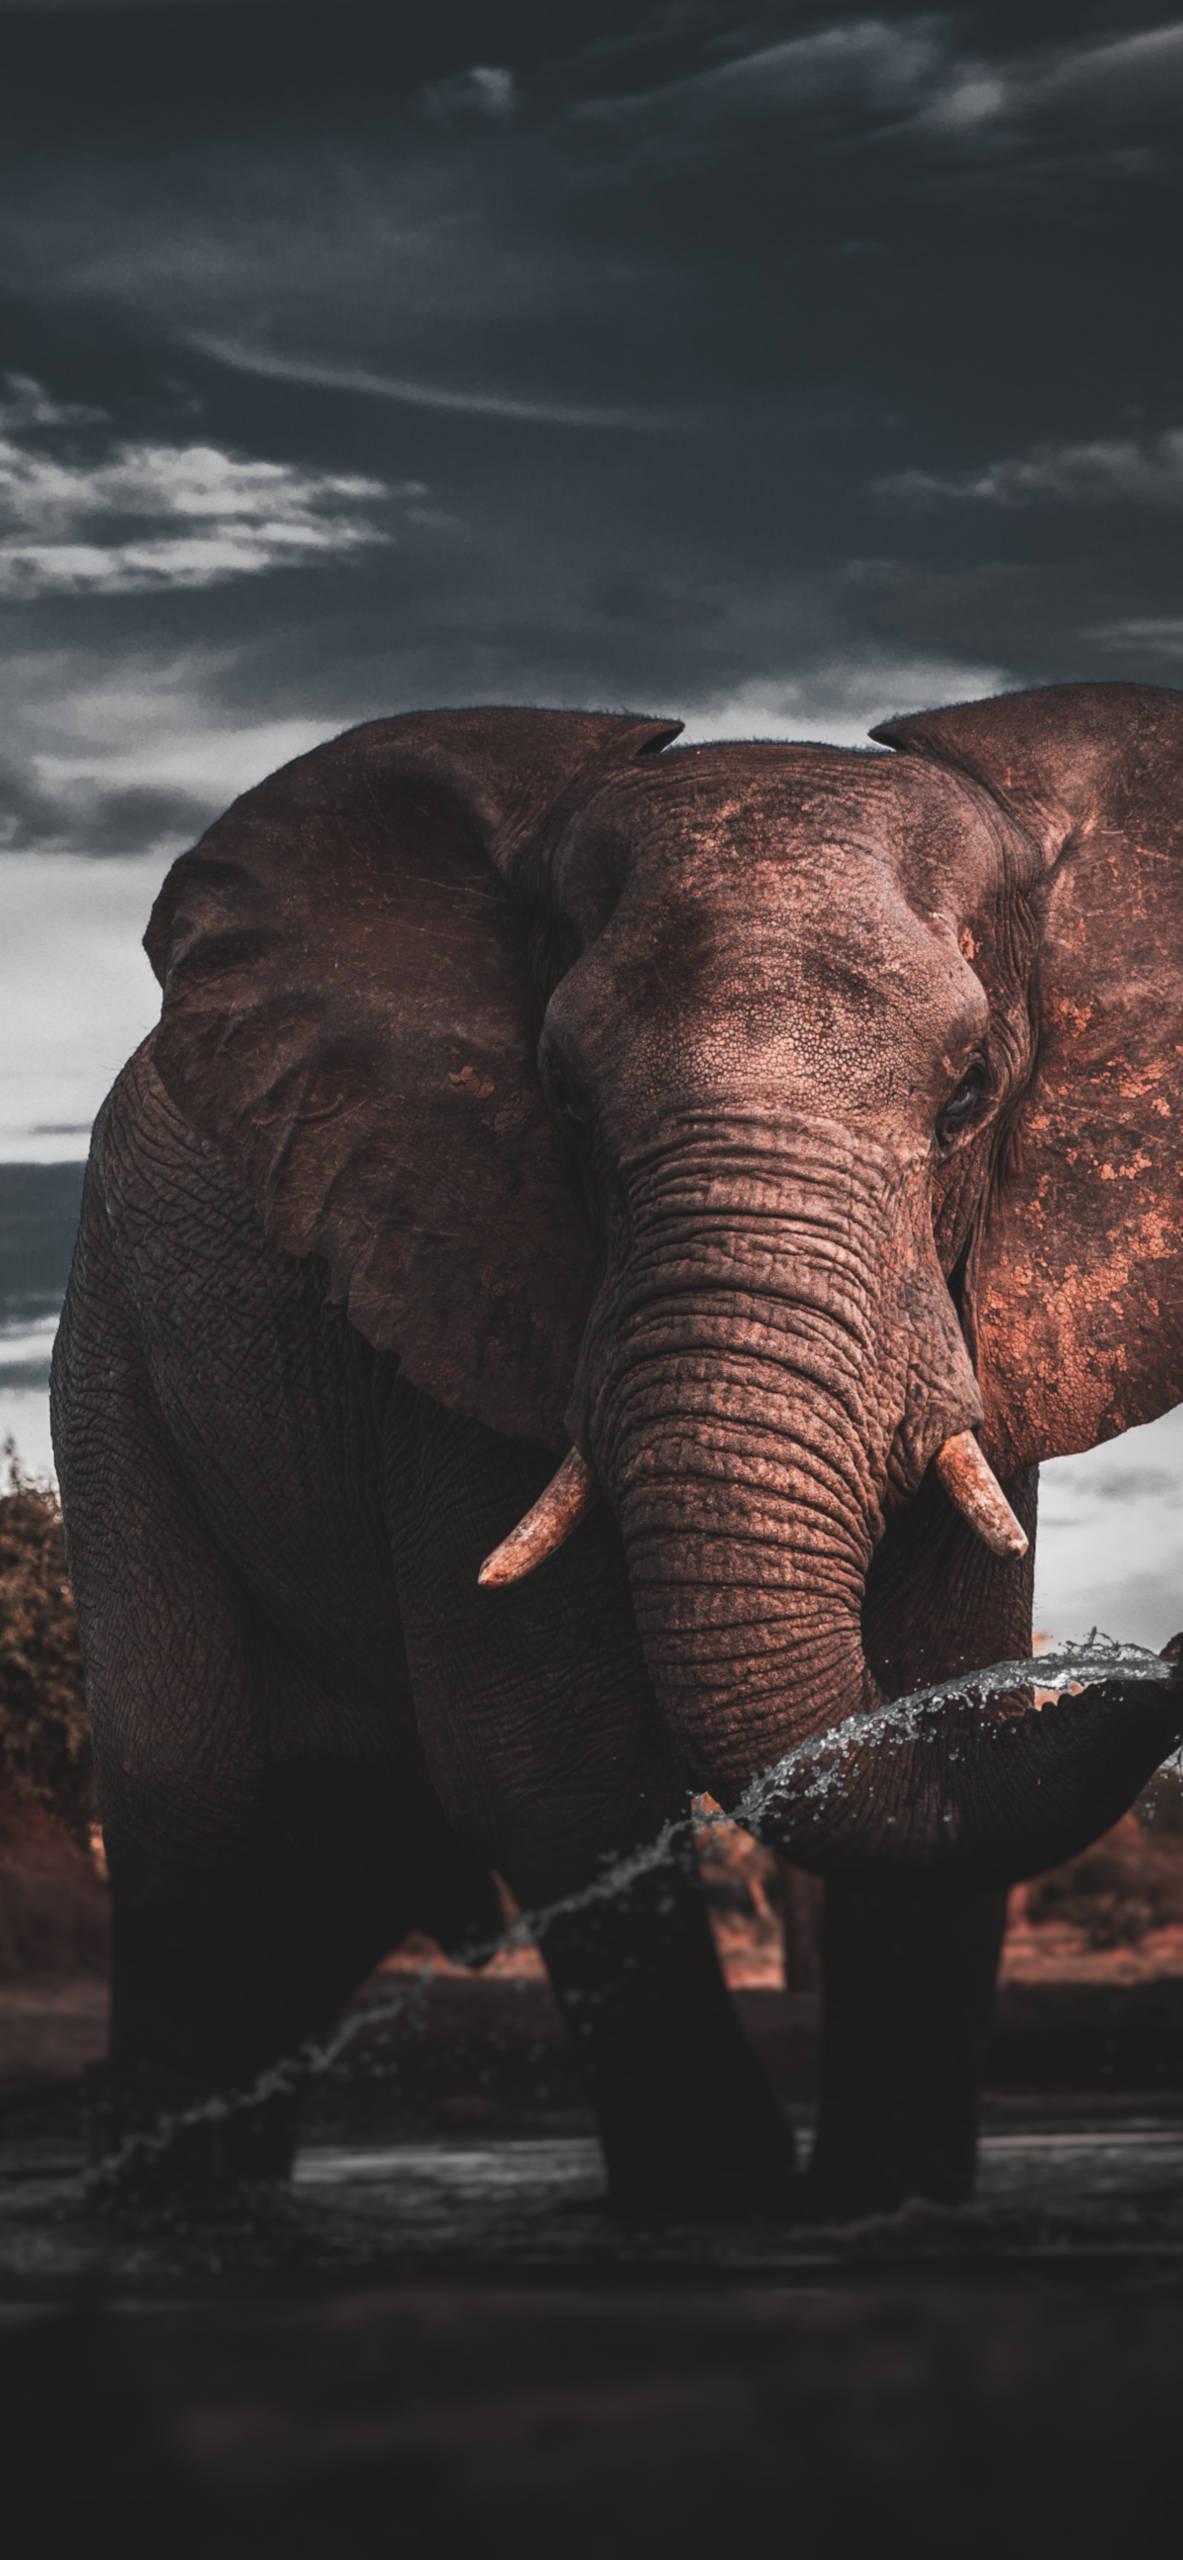 iPhone wallpapers elephanth botswana Elephant